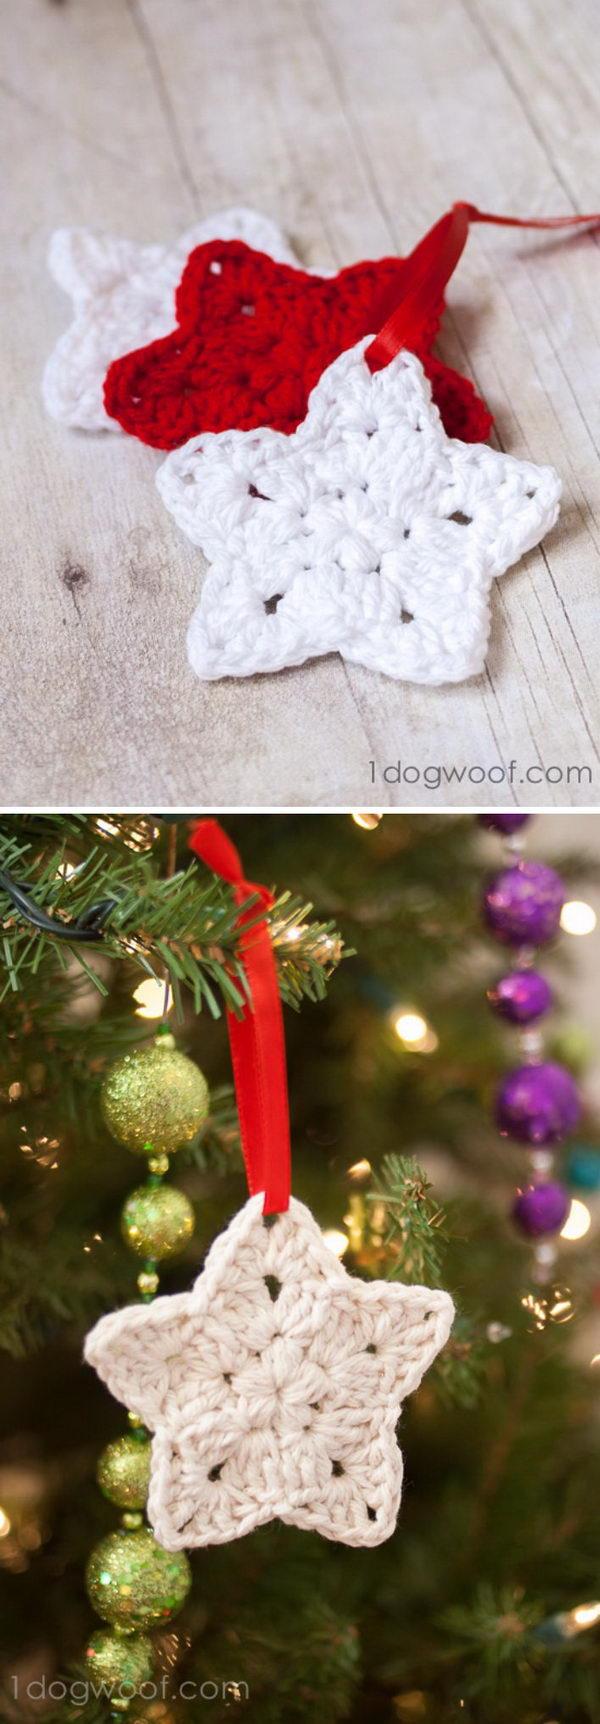 Crochet Star Ornament Pattern.